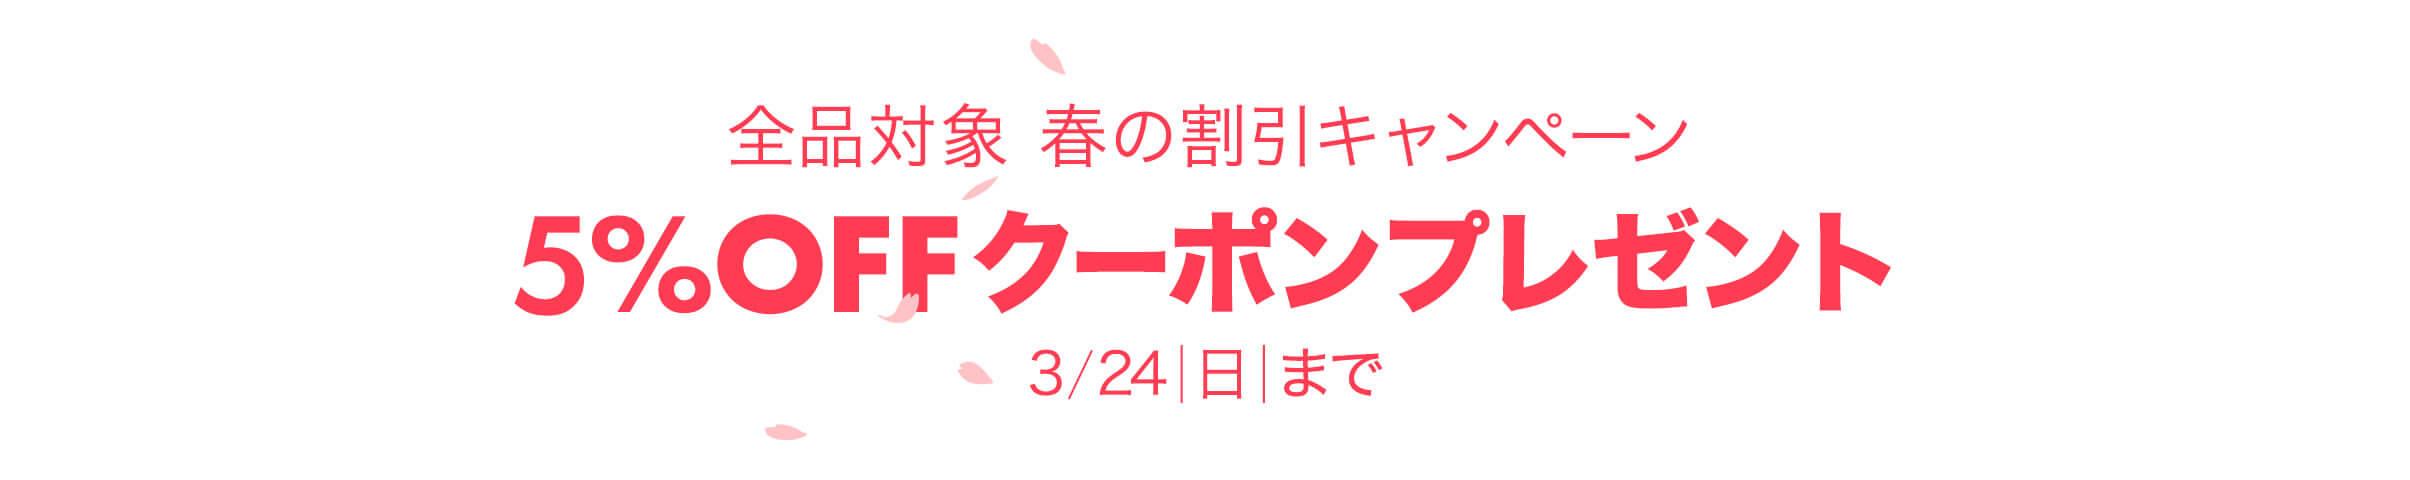 dinos(ディノス)1,500円割引クーポンキャンペーン